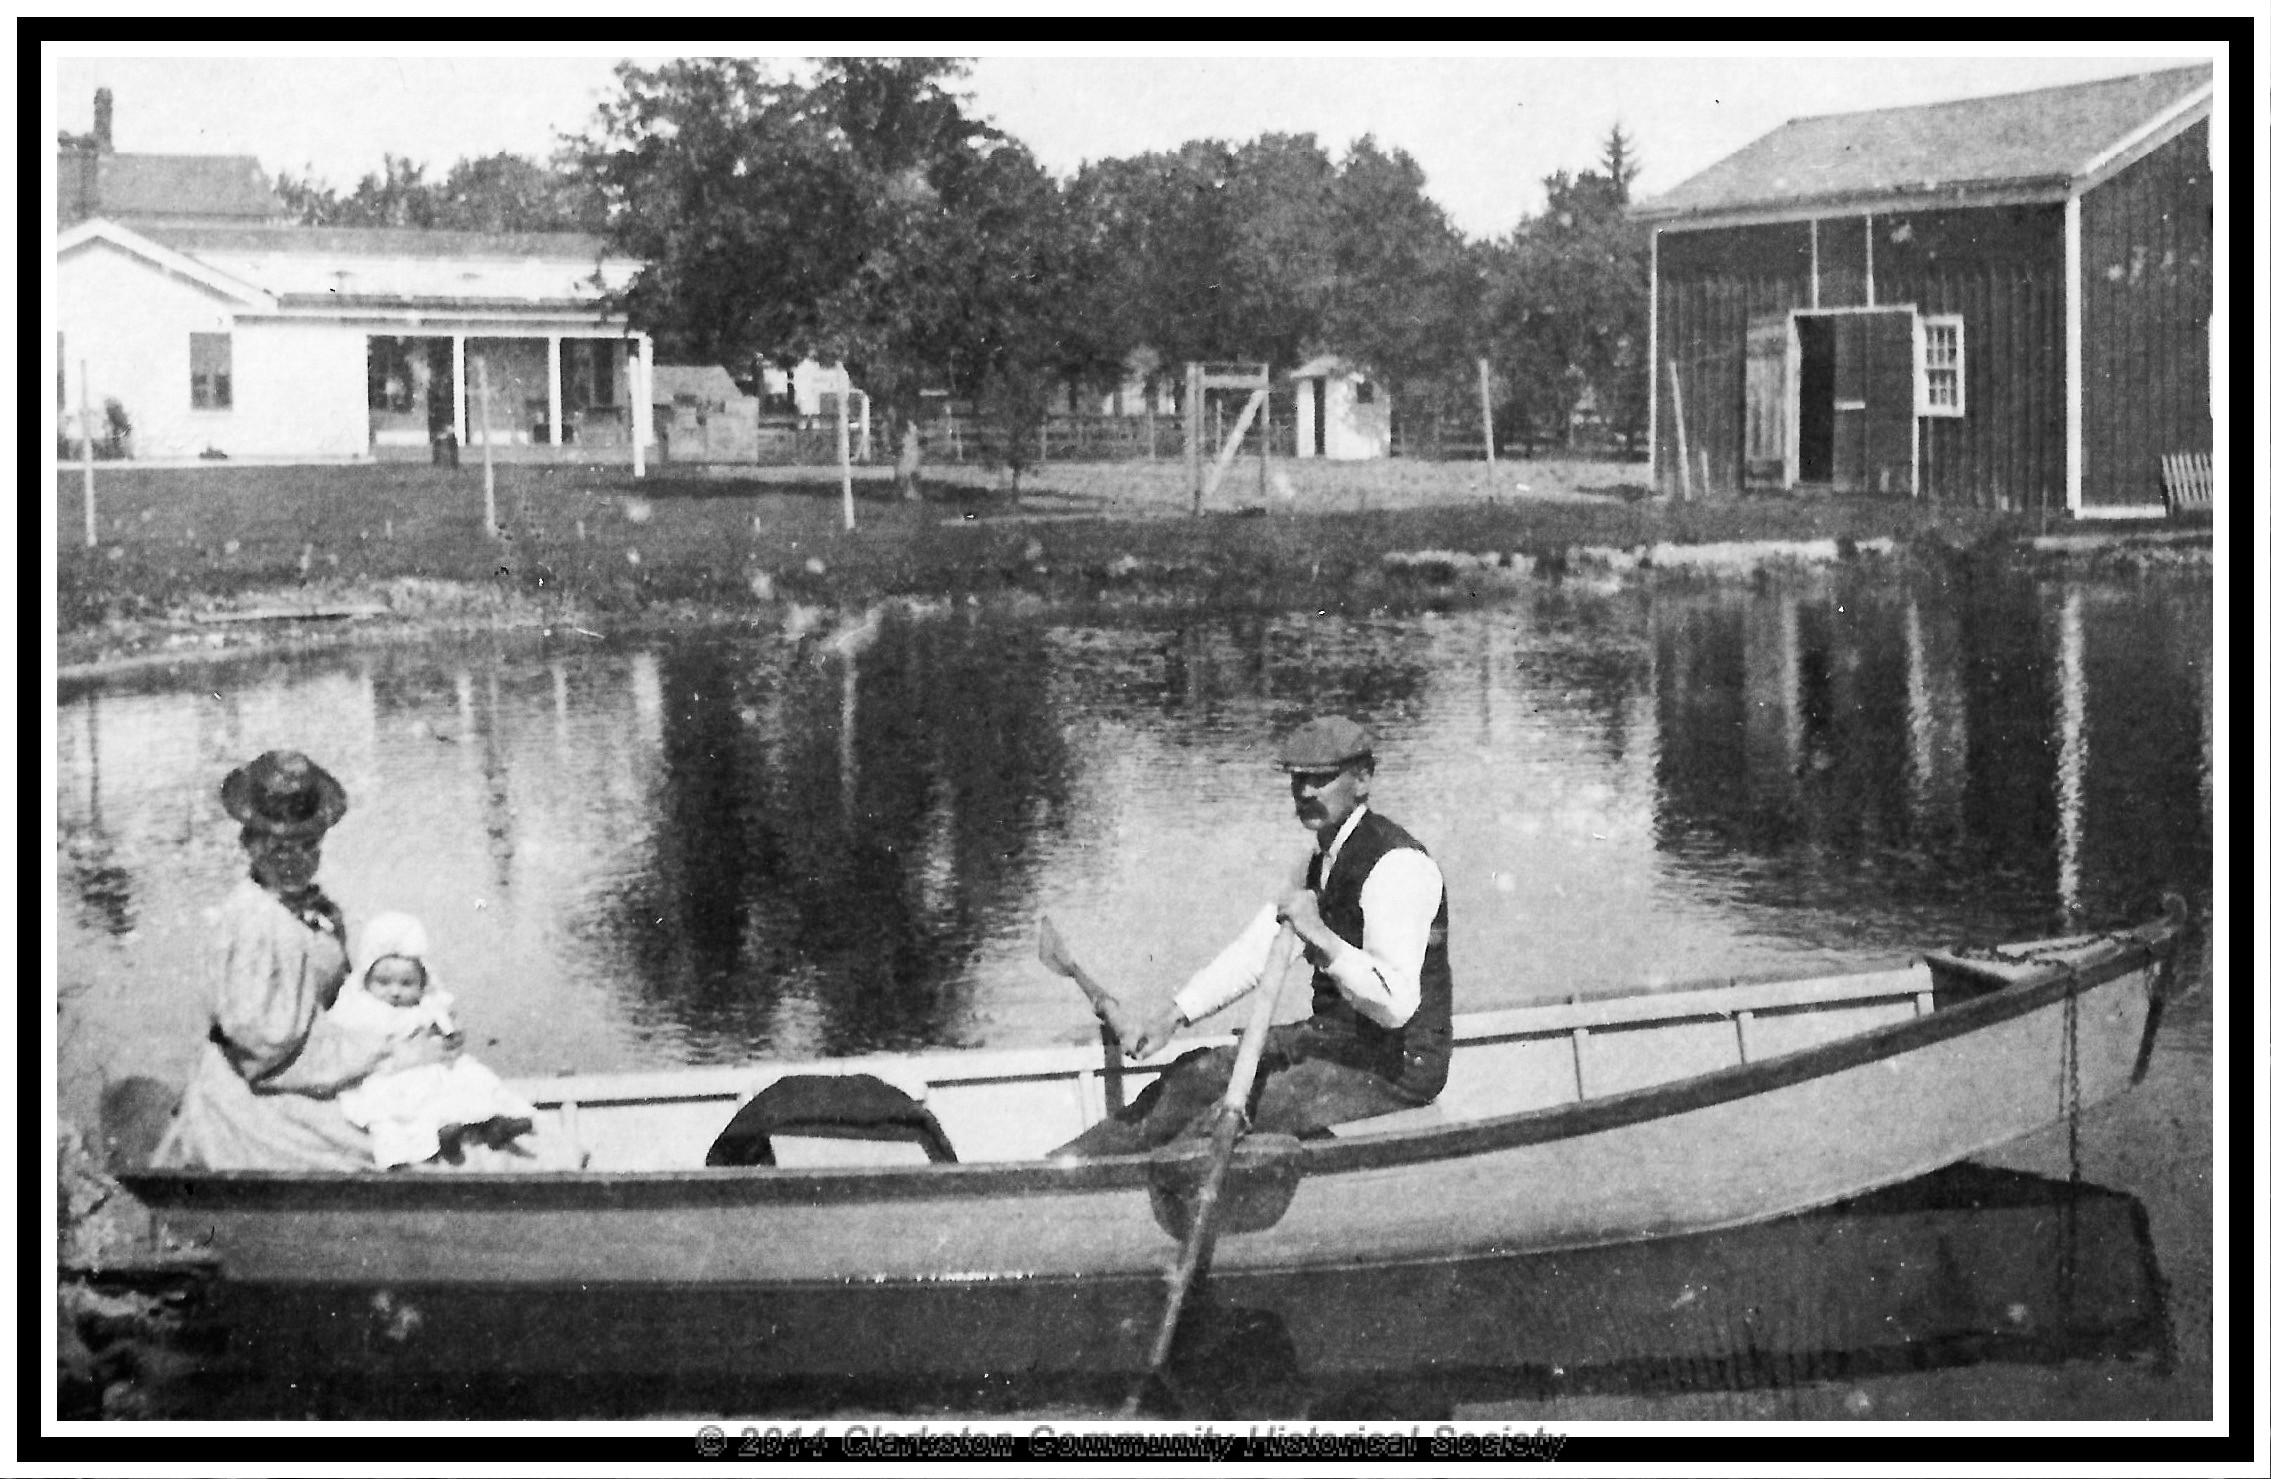 Clarkston Millpond, c. 1890